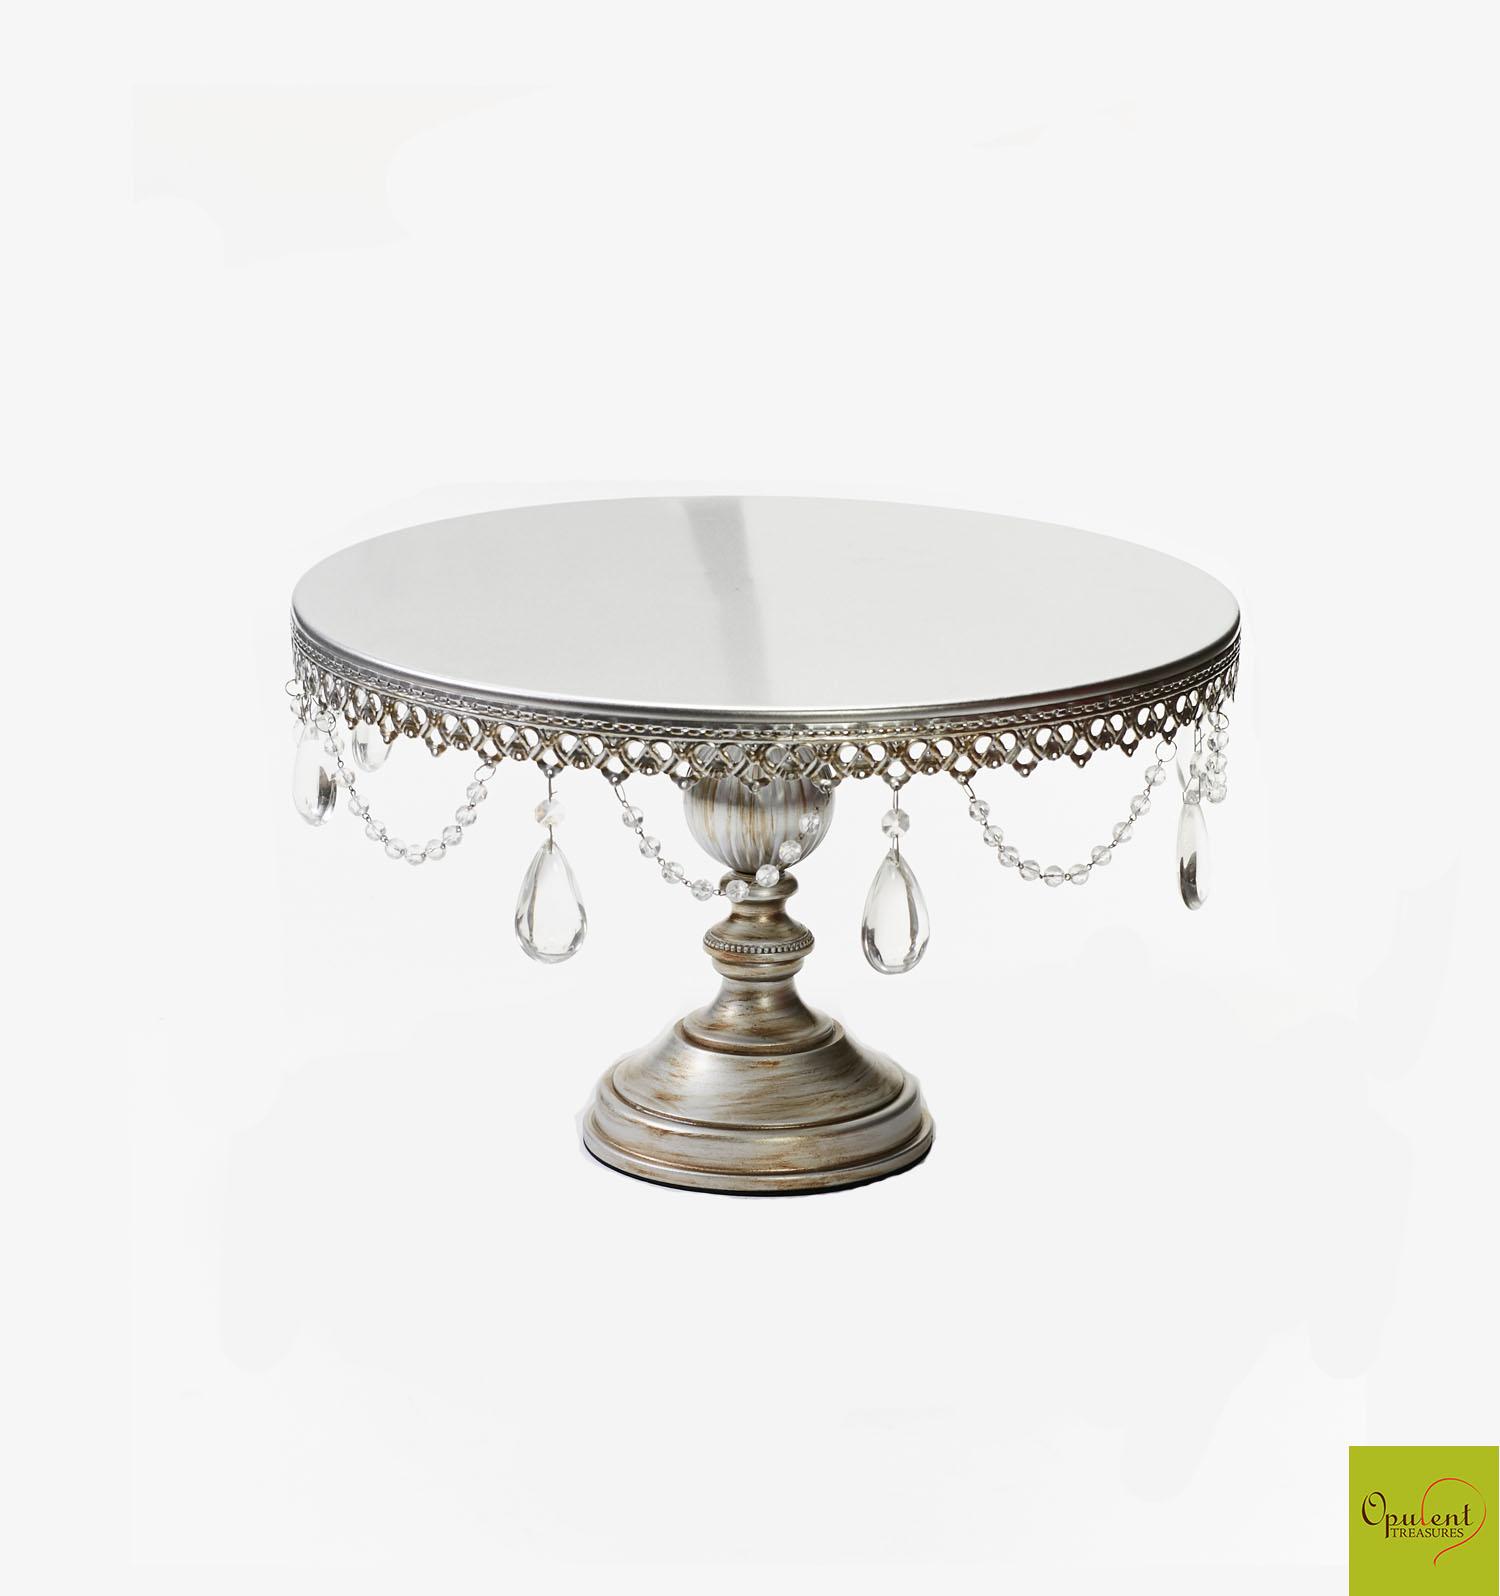 pedestal imports pier stand shop cake regency dome